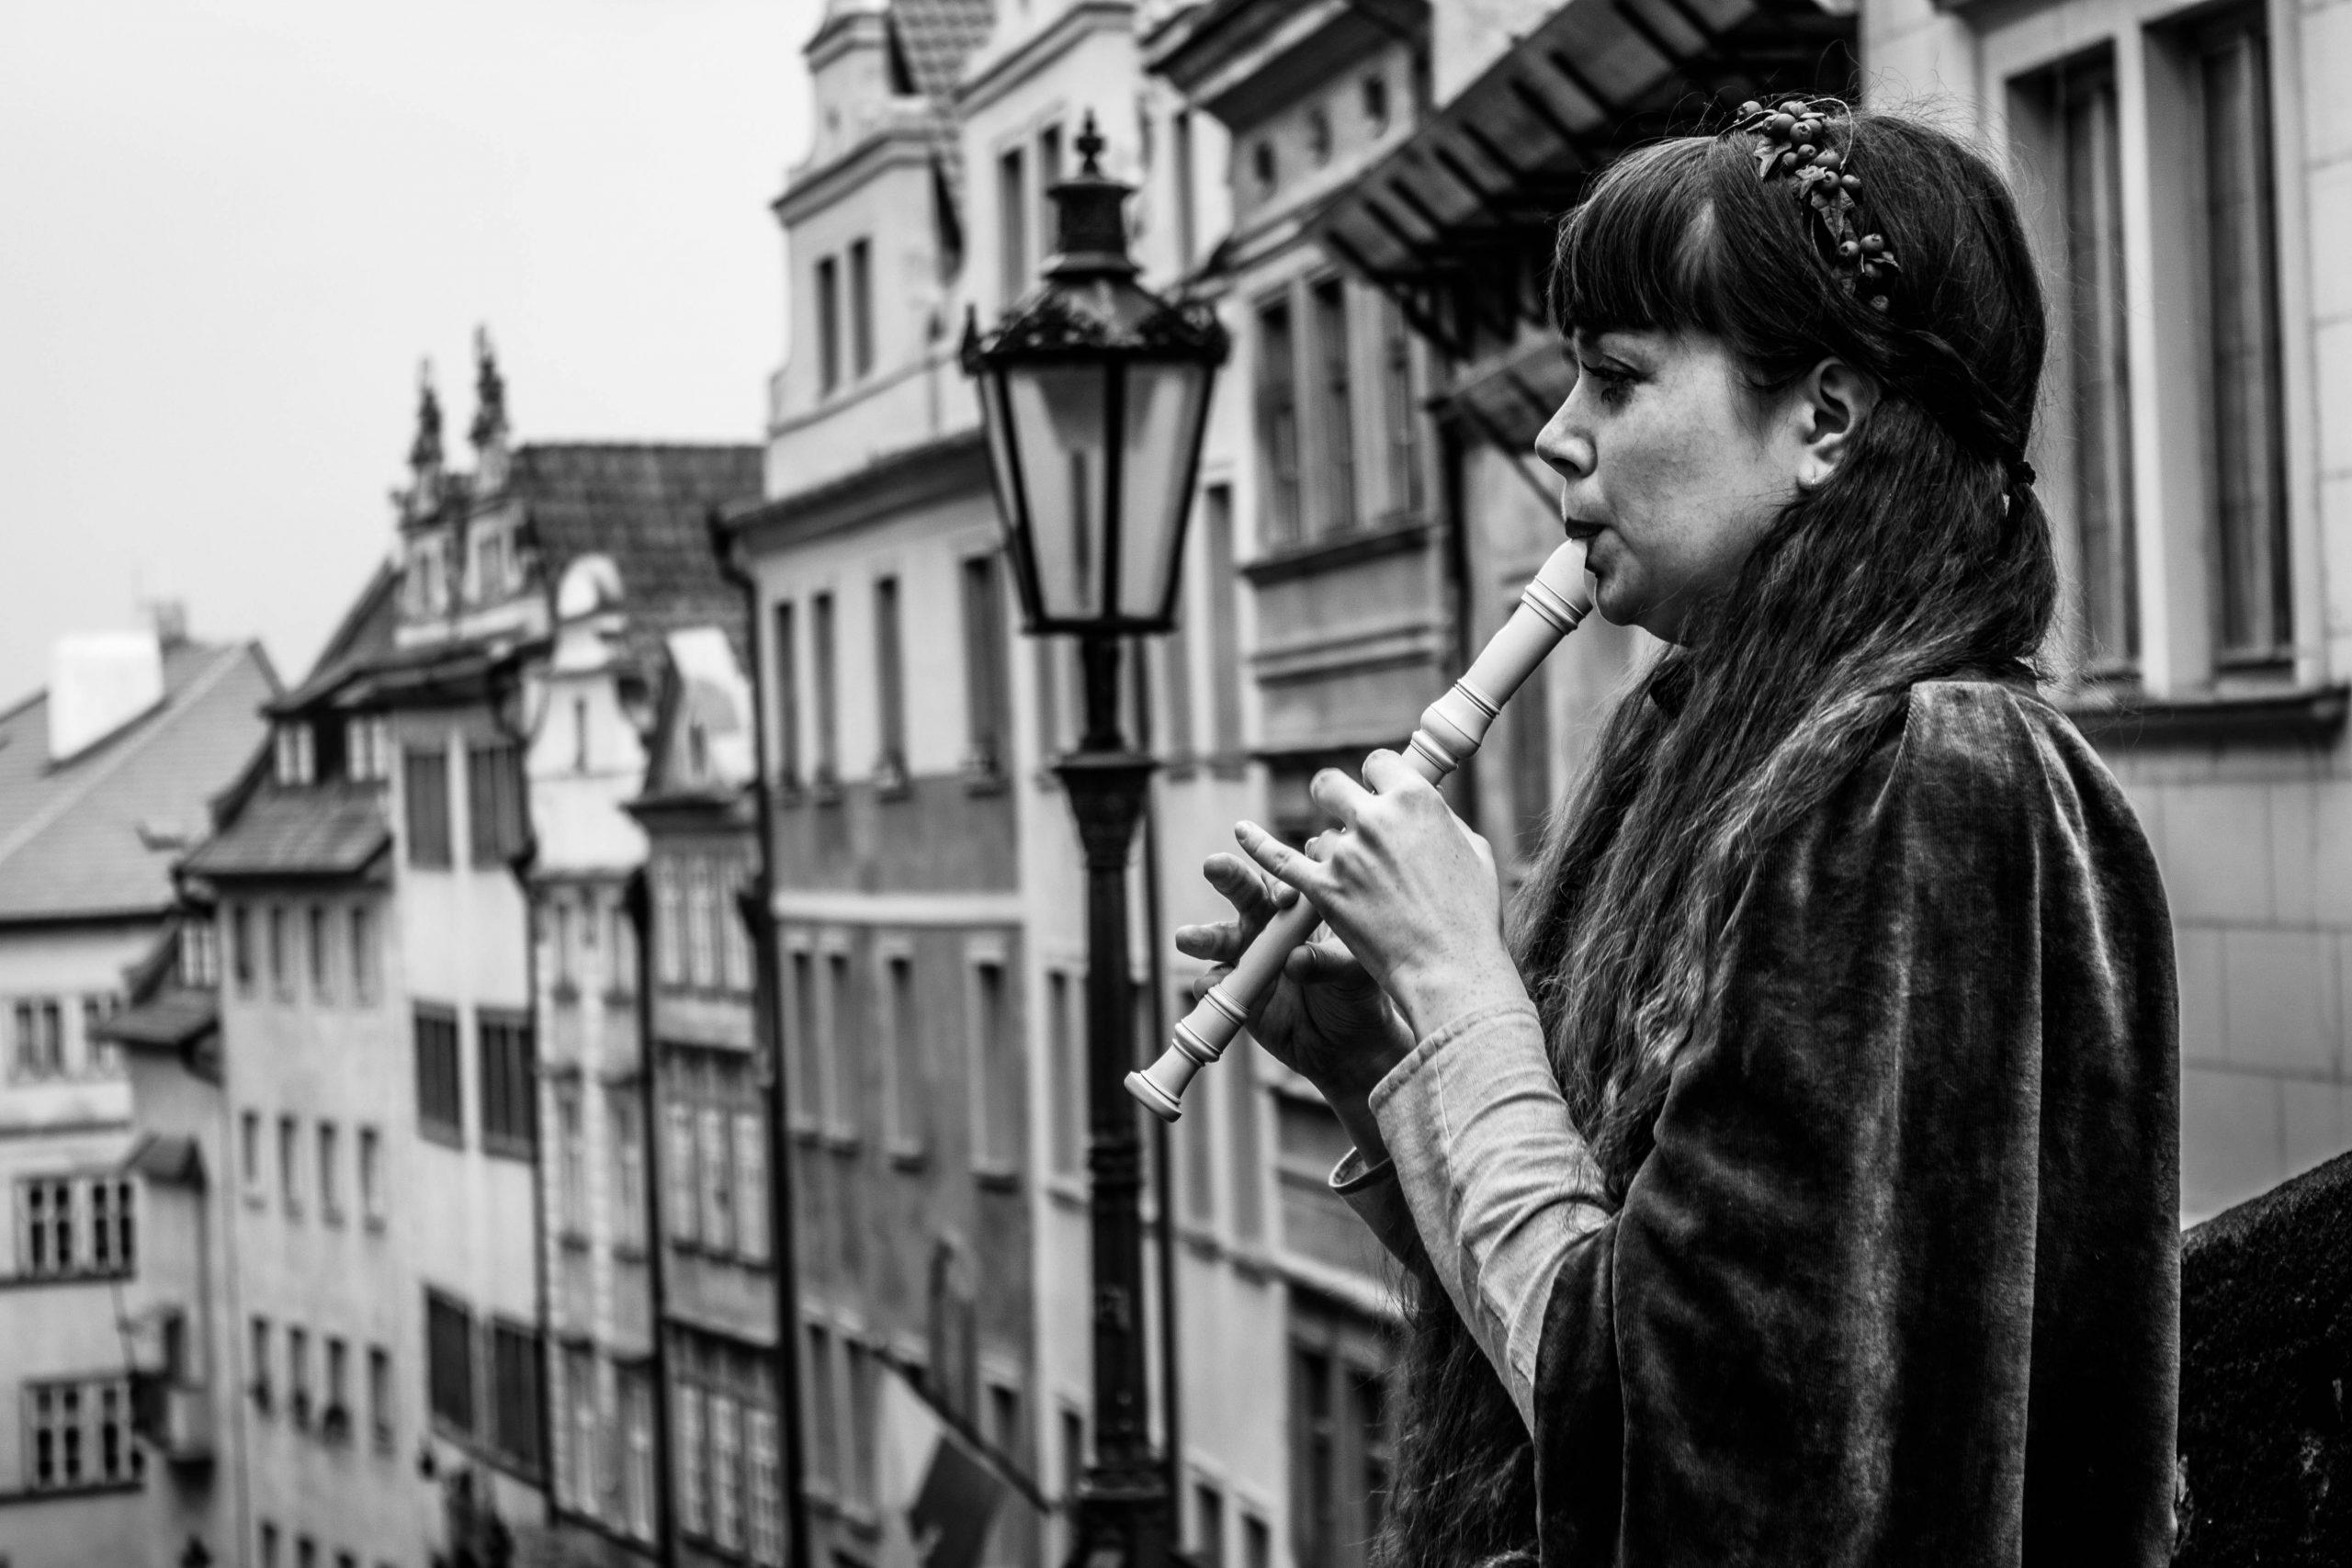 arte allegro - flauta dulce - escuela de musica - online - magia